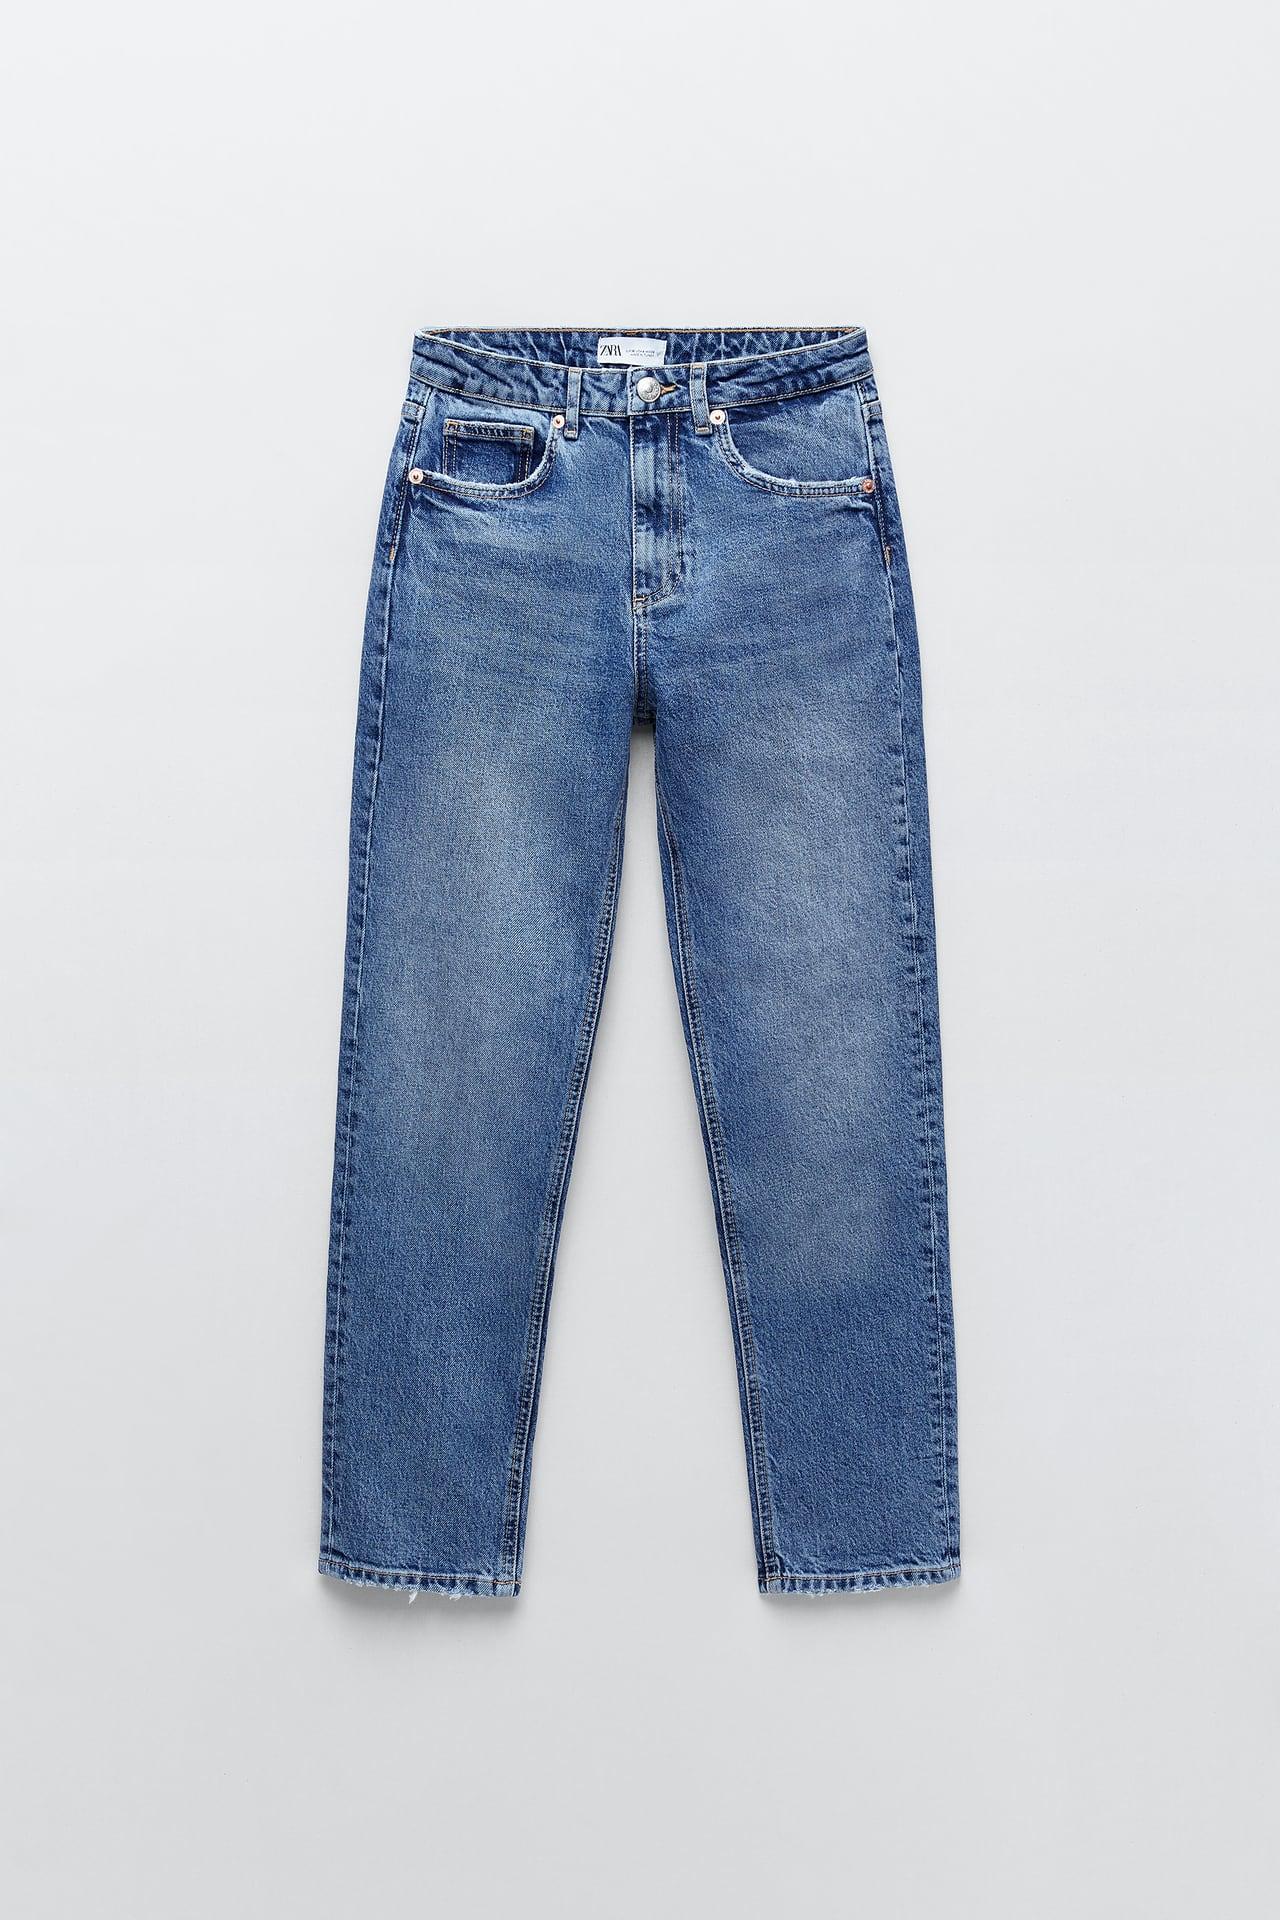 zara slim fit hi rise jeans